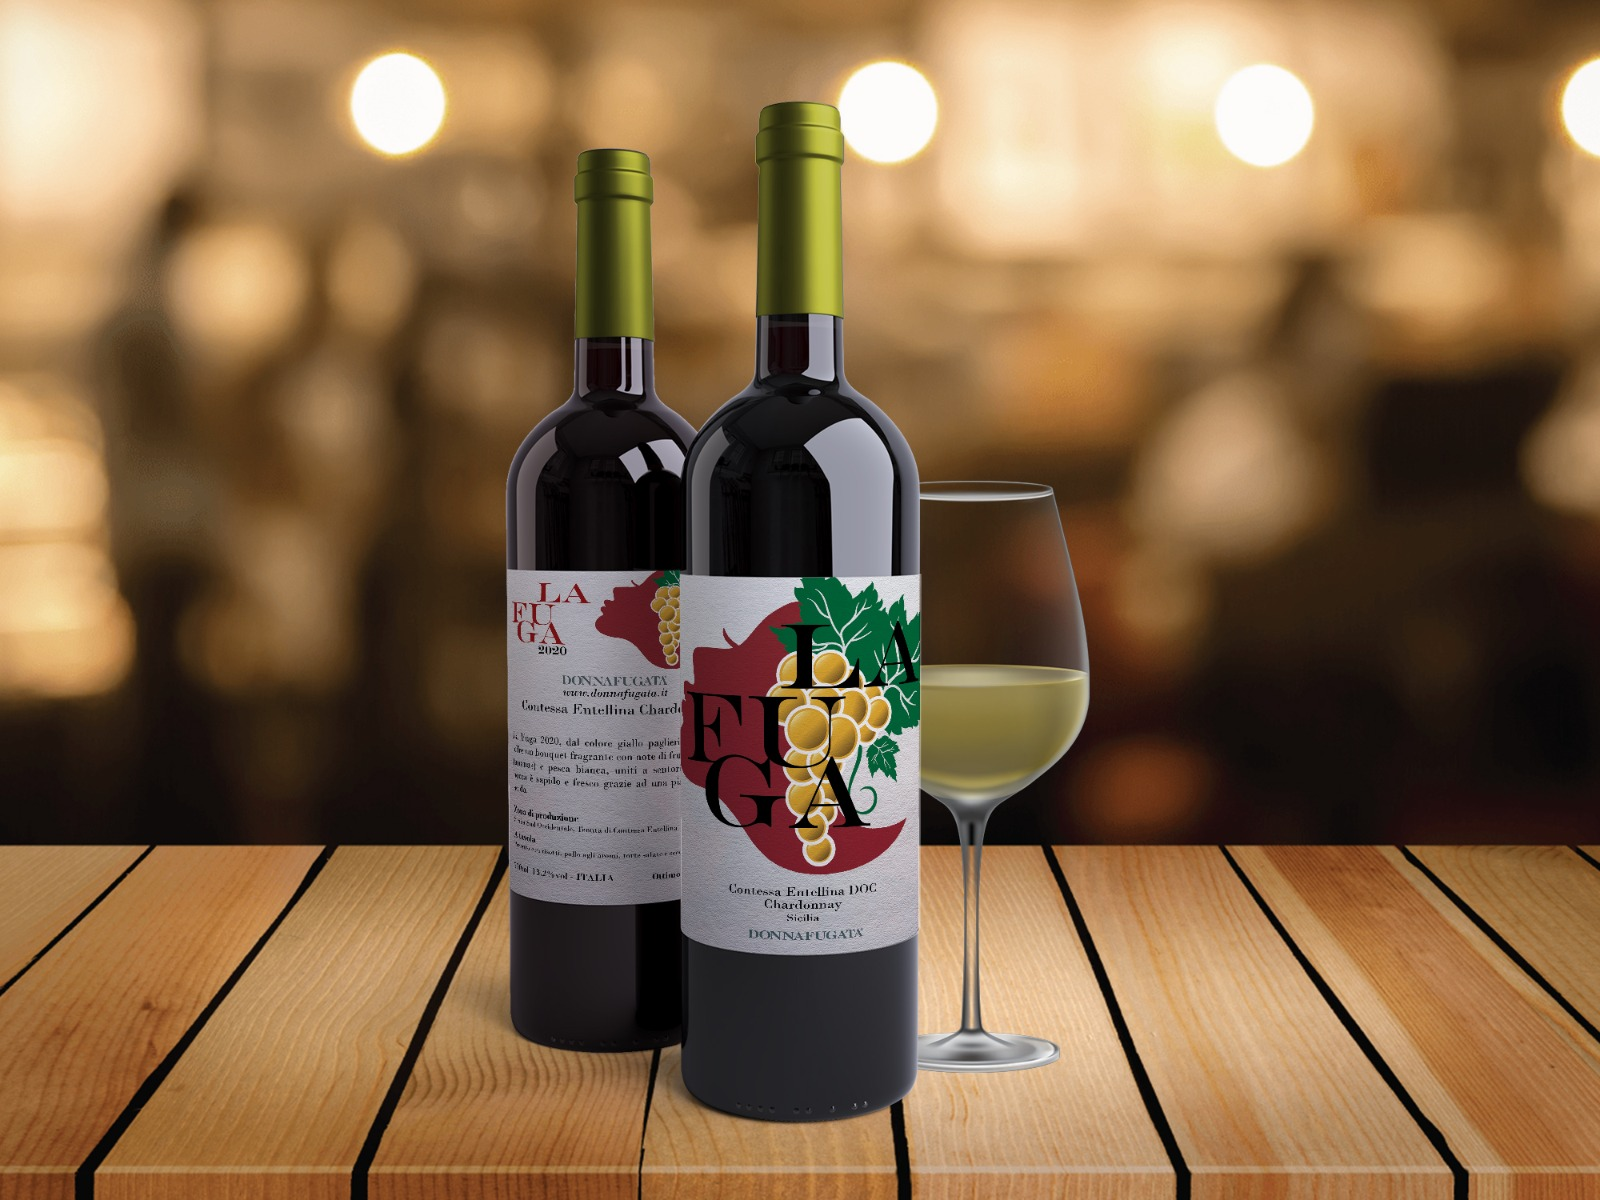 Domenico Giamboi, Etichette bottiglie di vino 2020